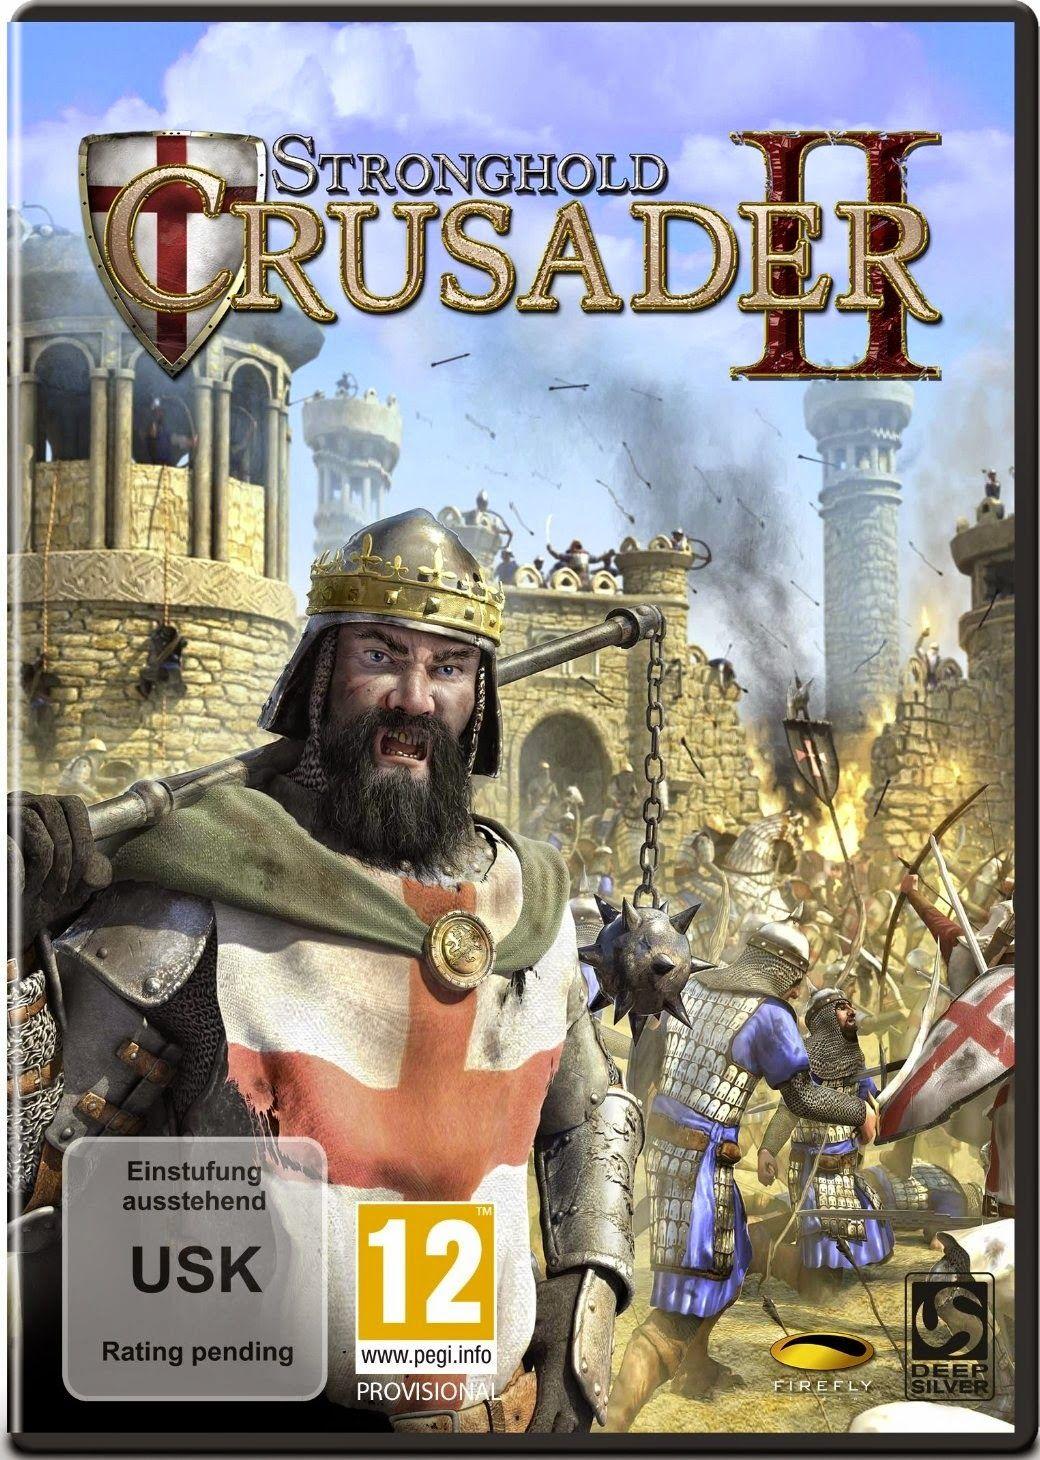 Trainer Stronghold Crusader 2 : trainer, stronghold, crusader, Stronghold, Crusader, تحميل, Sodusvillage.org